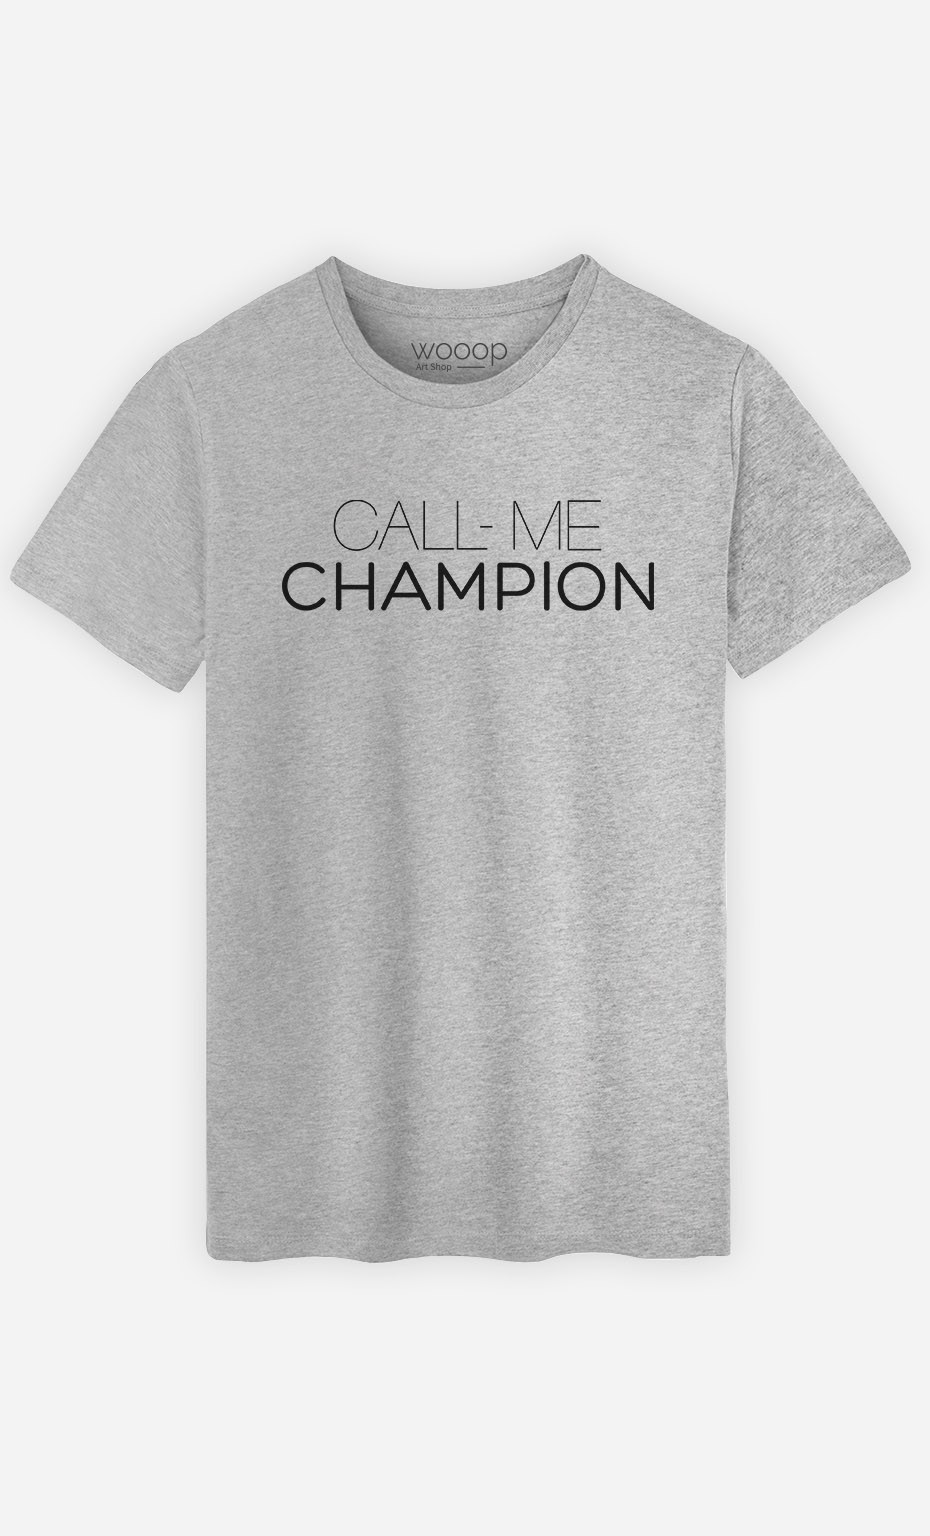 T-Shirt Call Me Champion